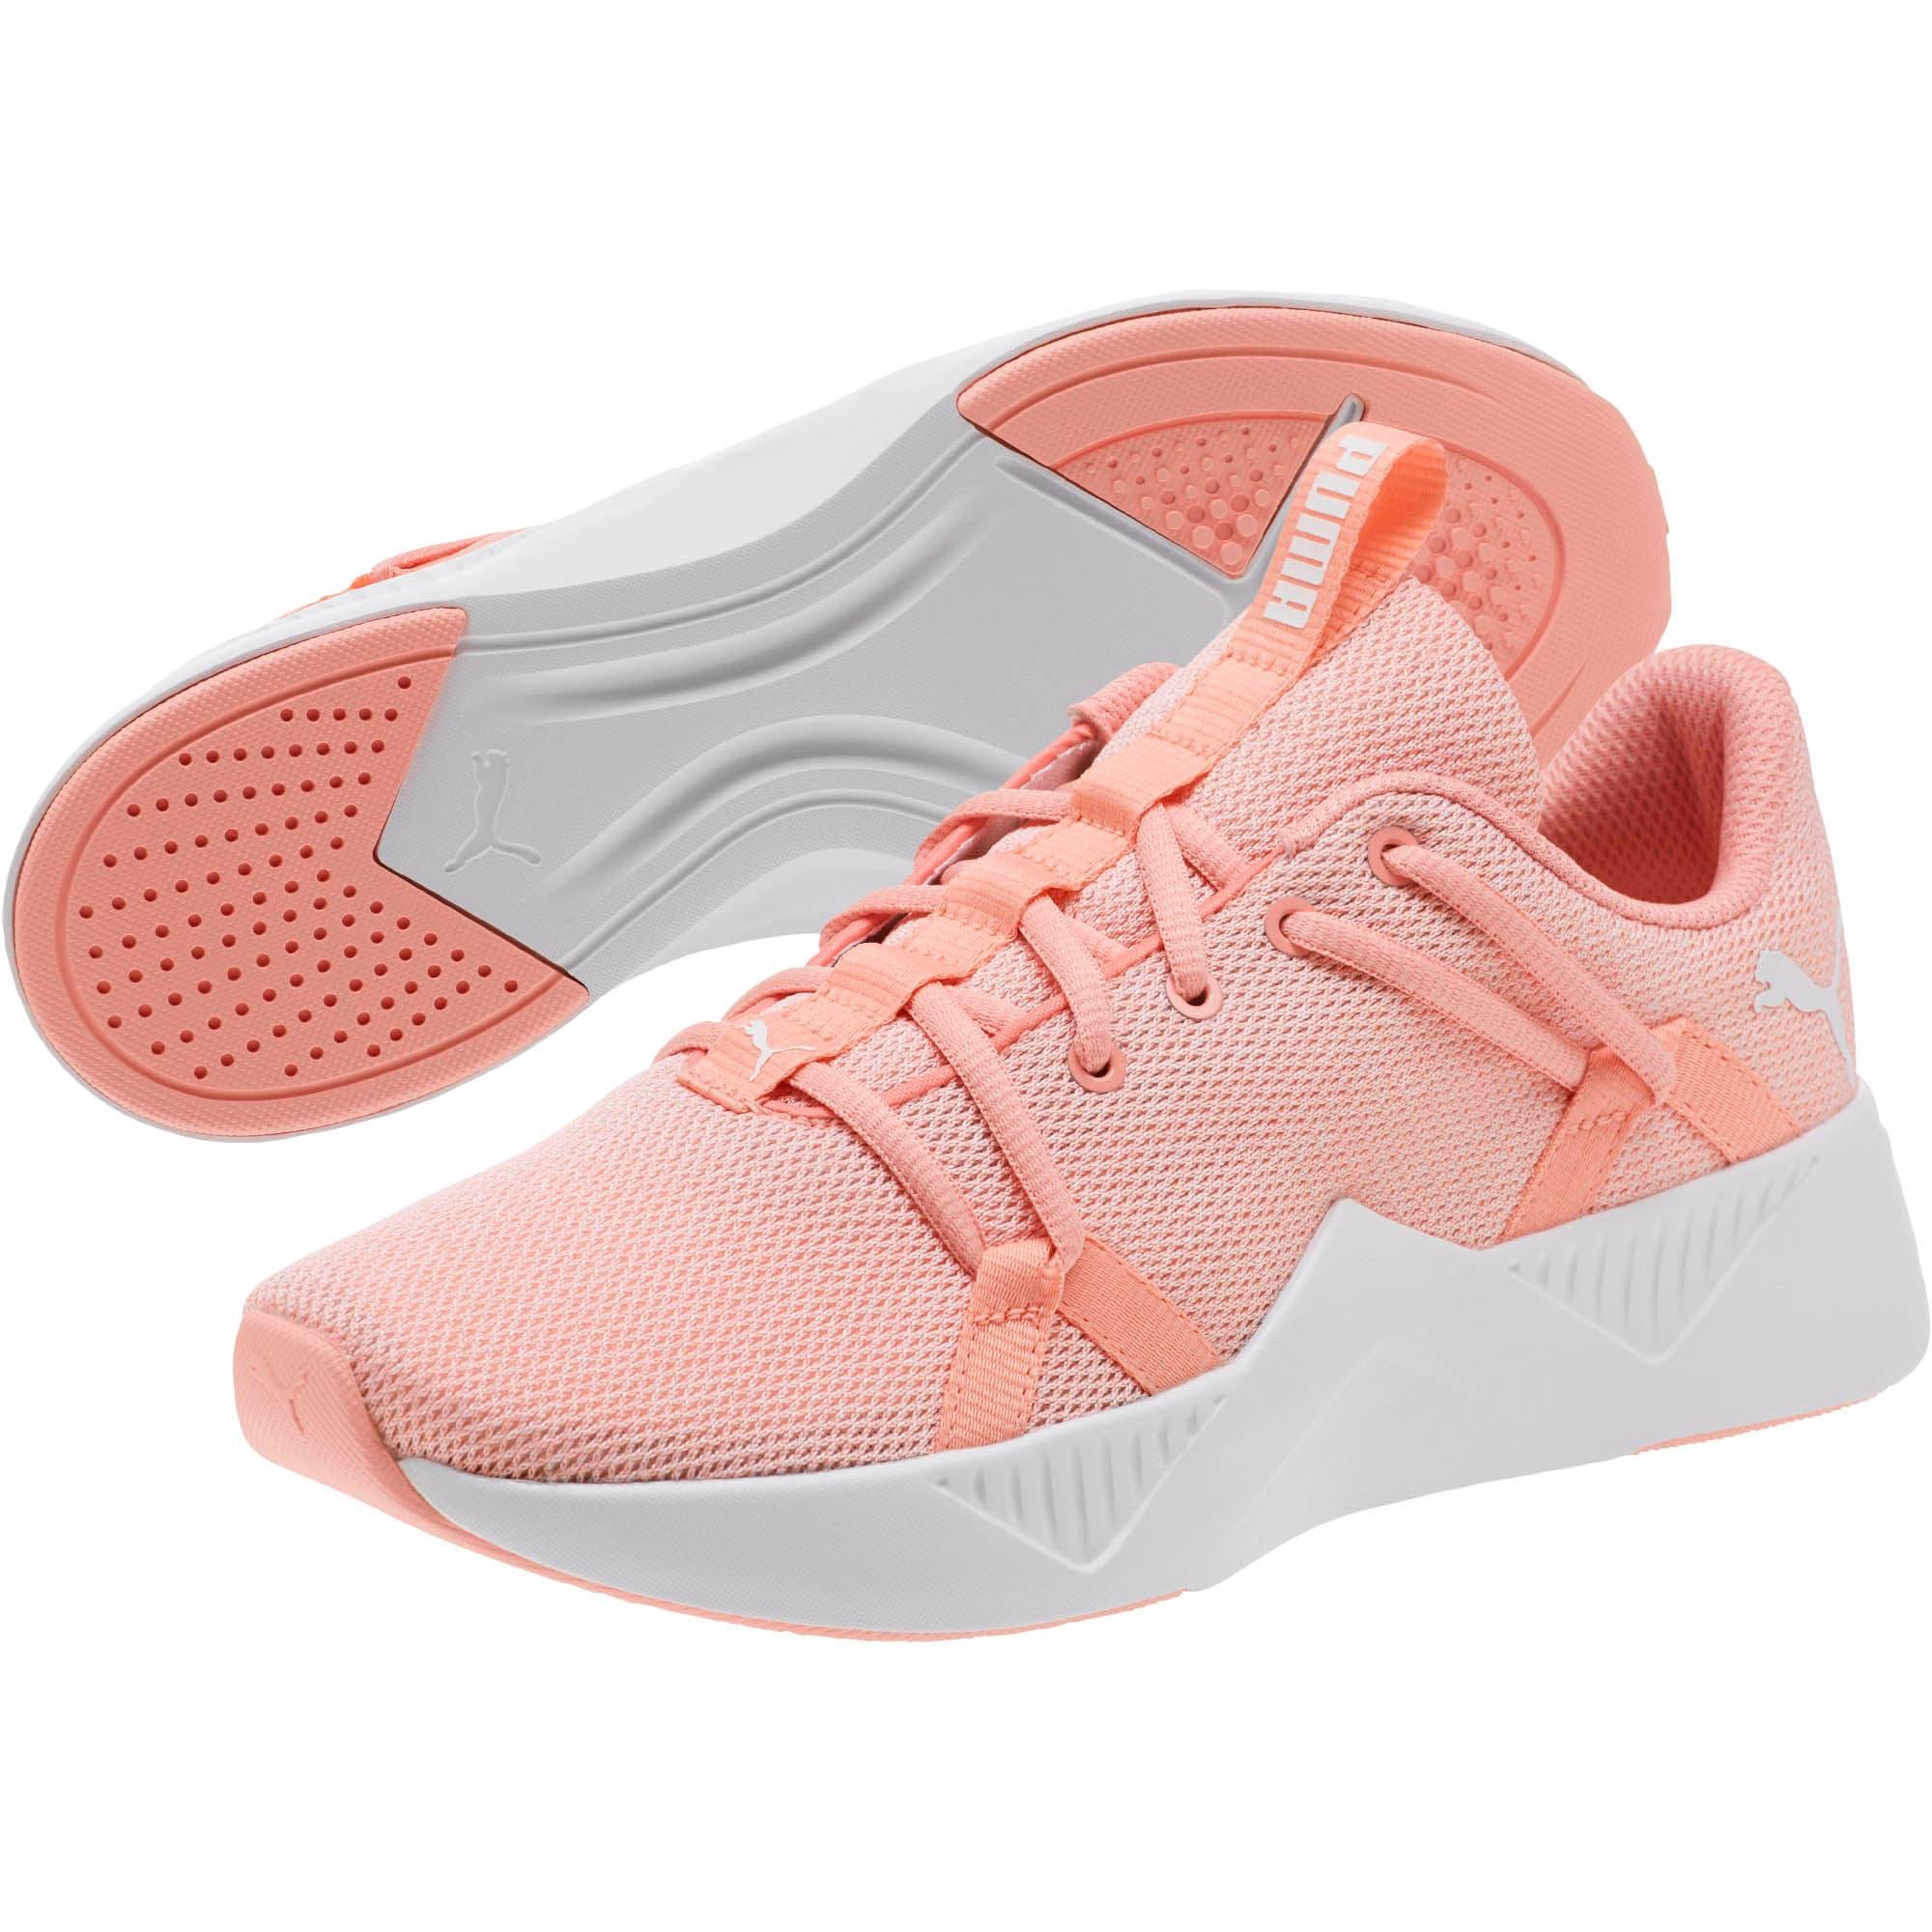 Thumbnail 2 of Incite Knit Women's Training Shoes, Peach Bud-Puma White, medium